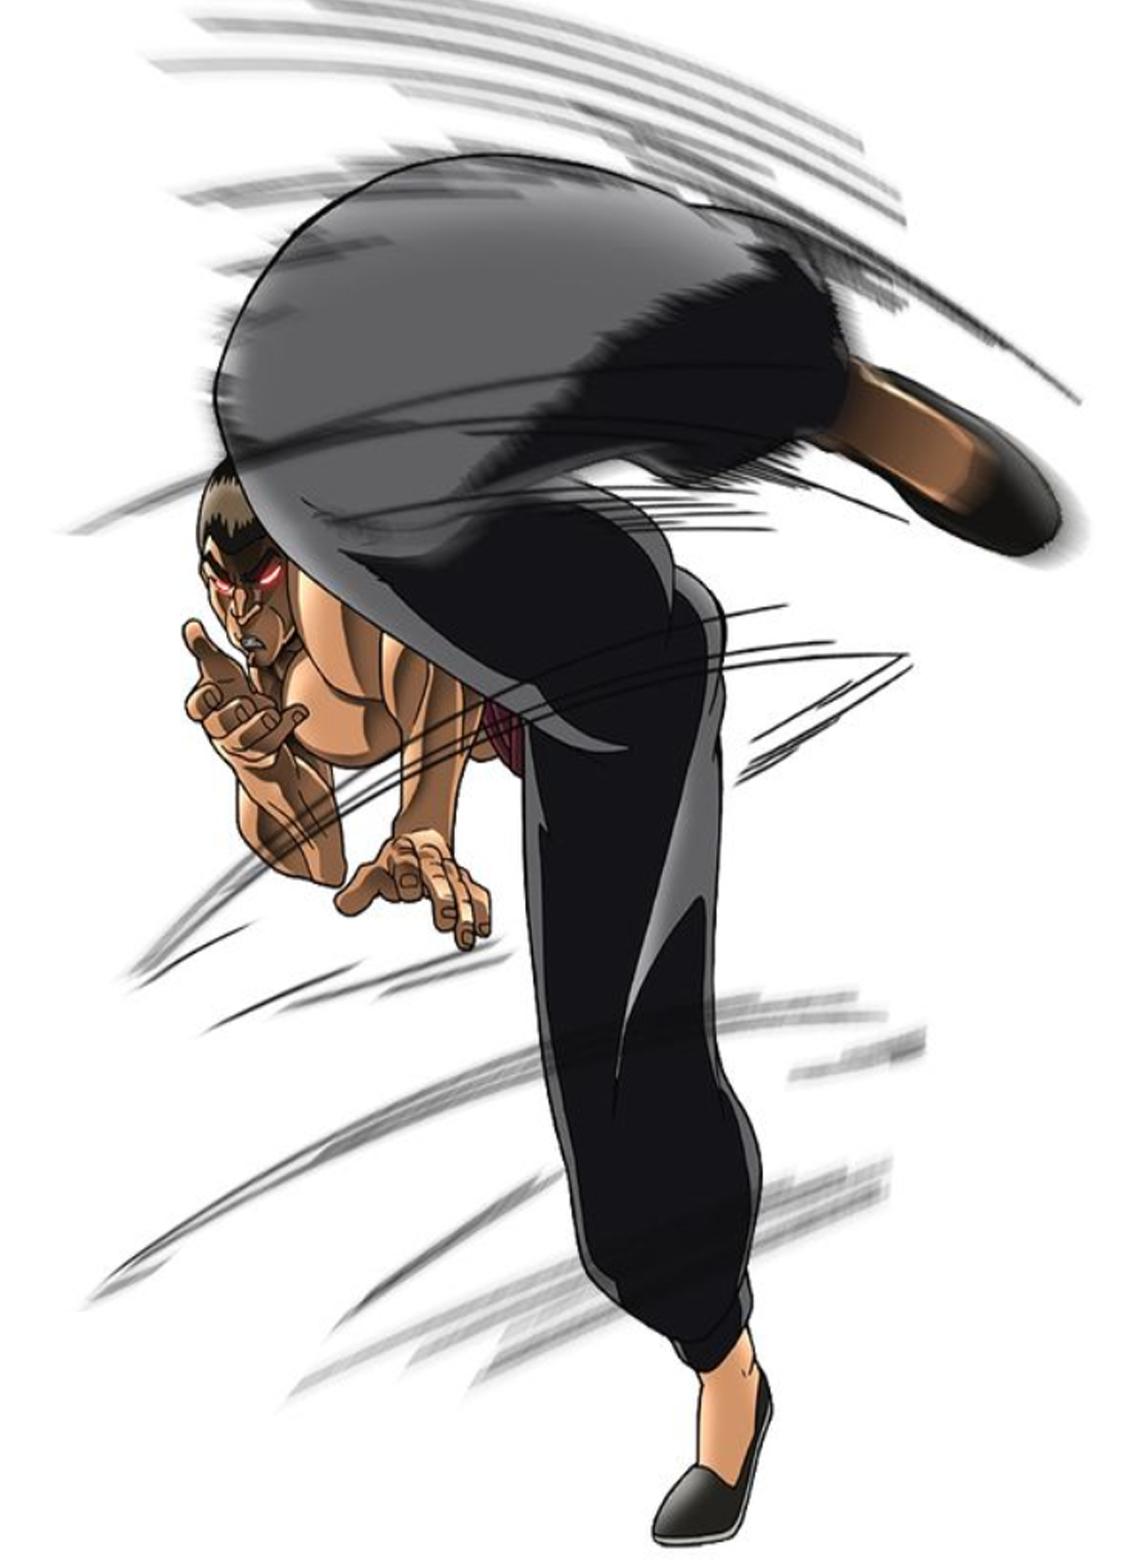 Art of fighting image by Femi on Sketching Cartoon